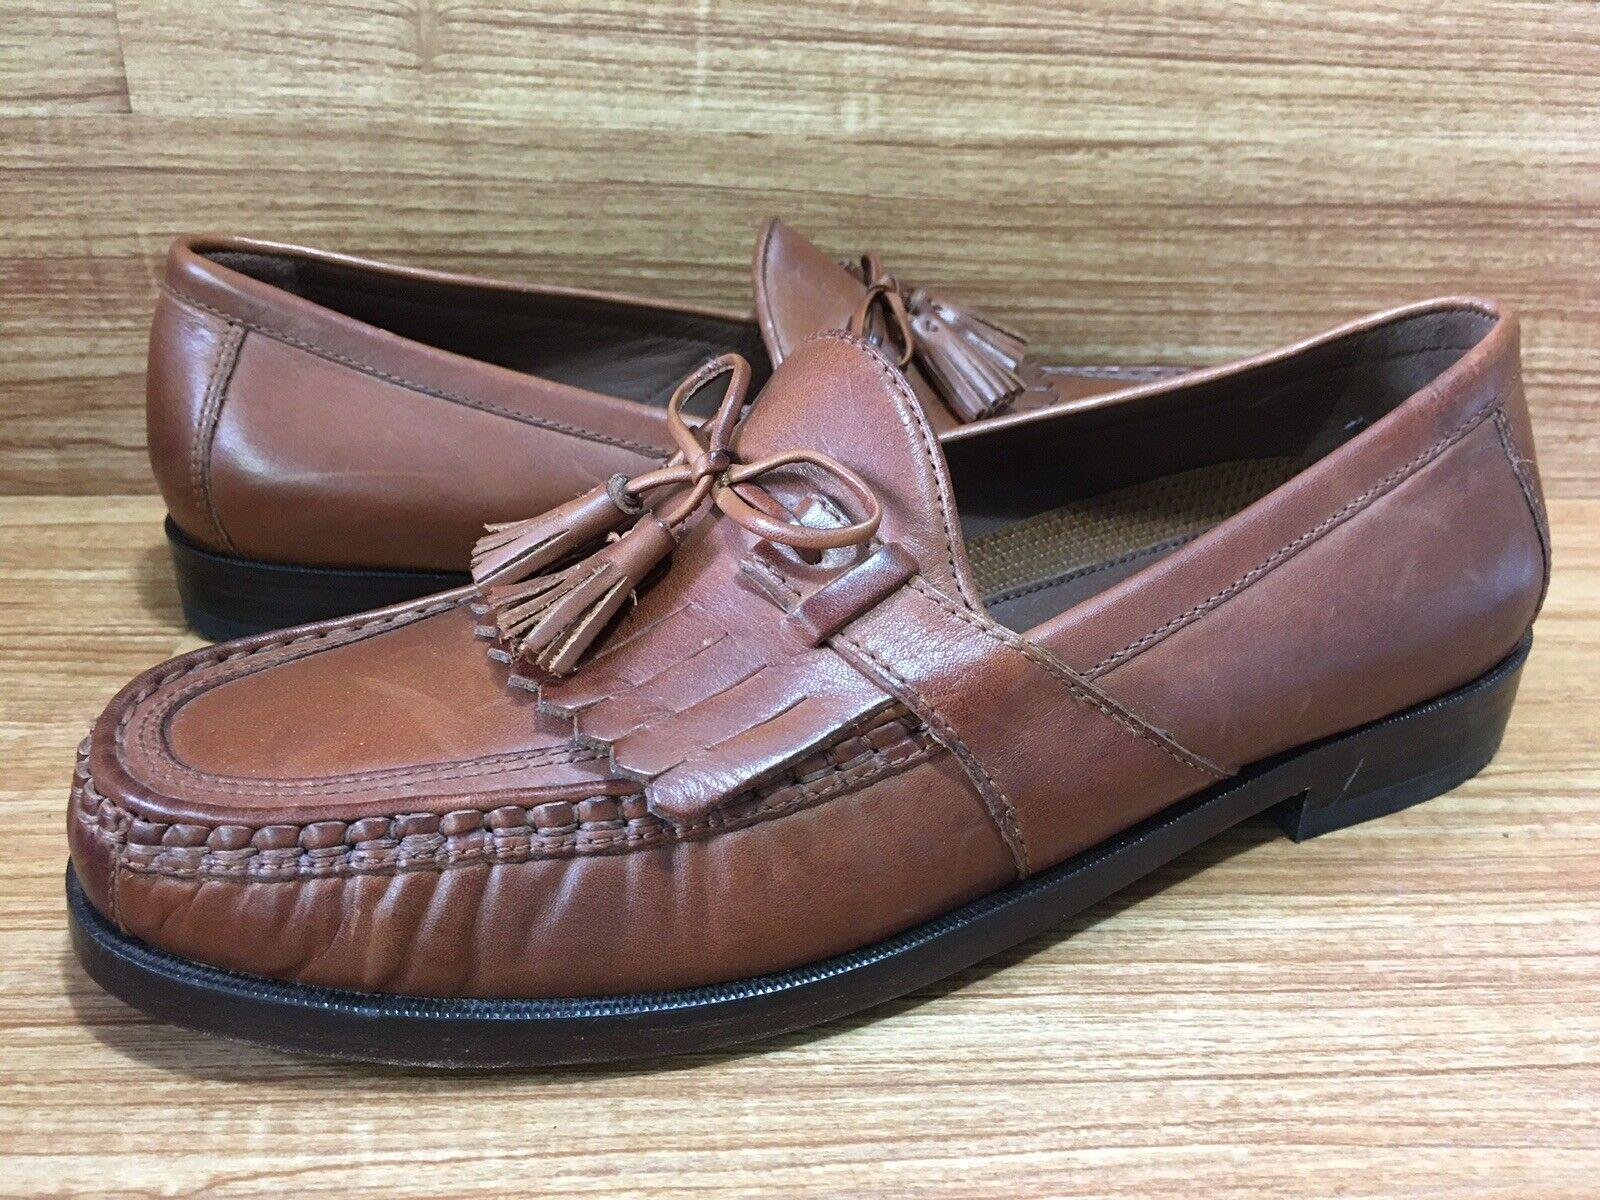 Johnston Murphy Sz 9 M Leather Brown Saddle Kiltie Tassel Slip On Loafer NEW